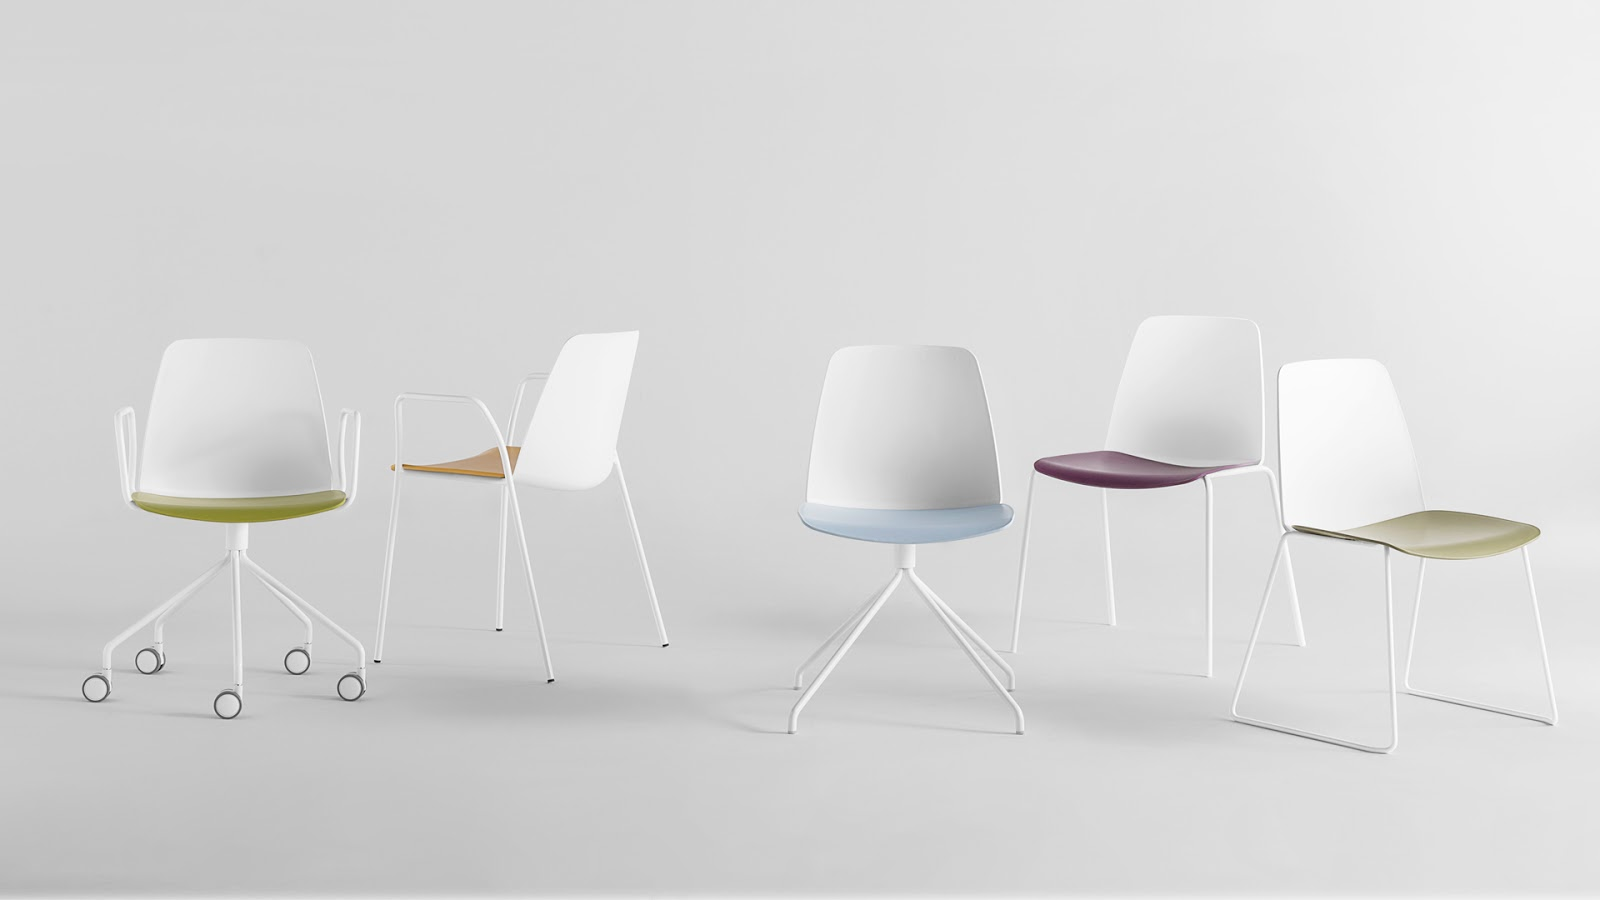 Vidalcontract unnia la silla de infinitas combinaciones for Silla unnia inclass